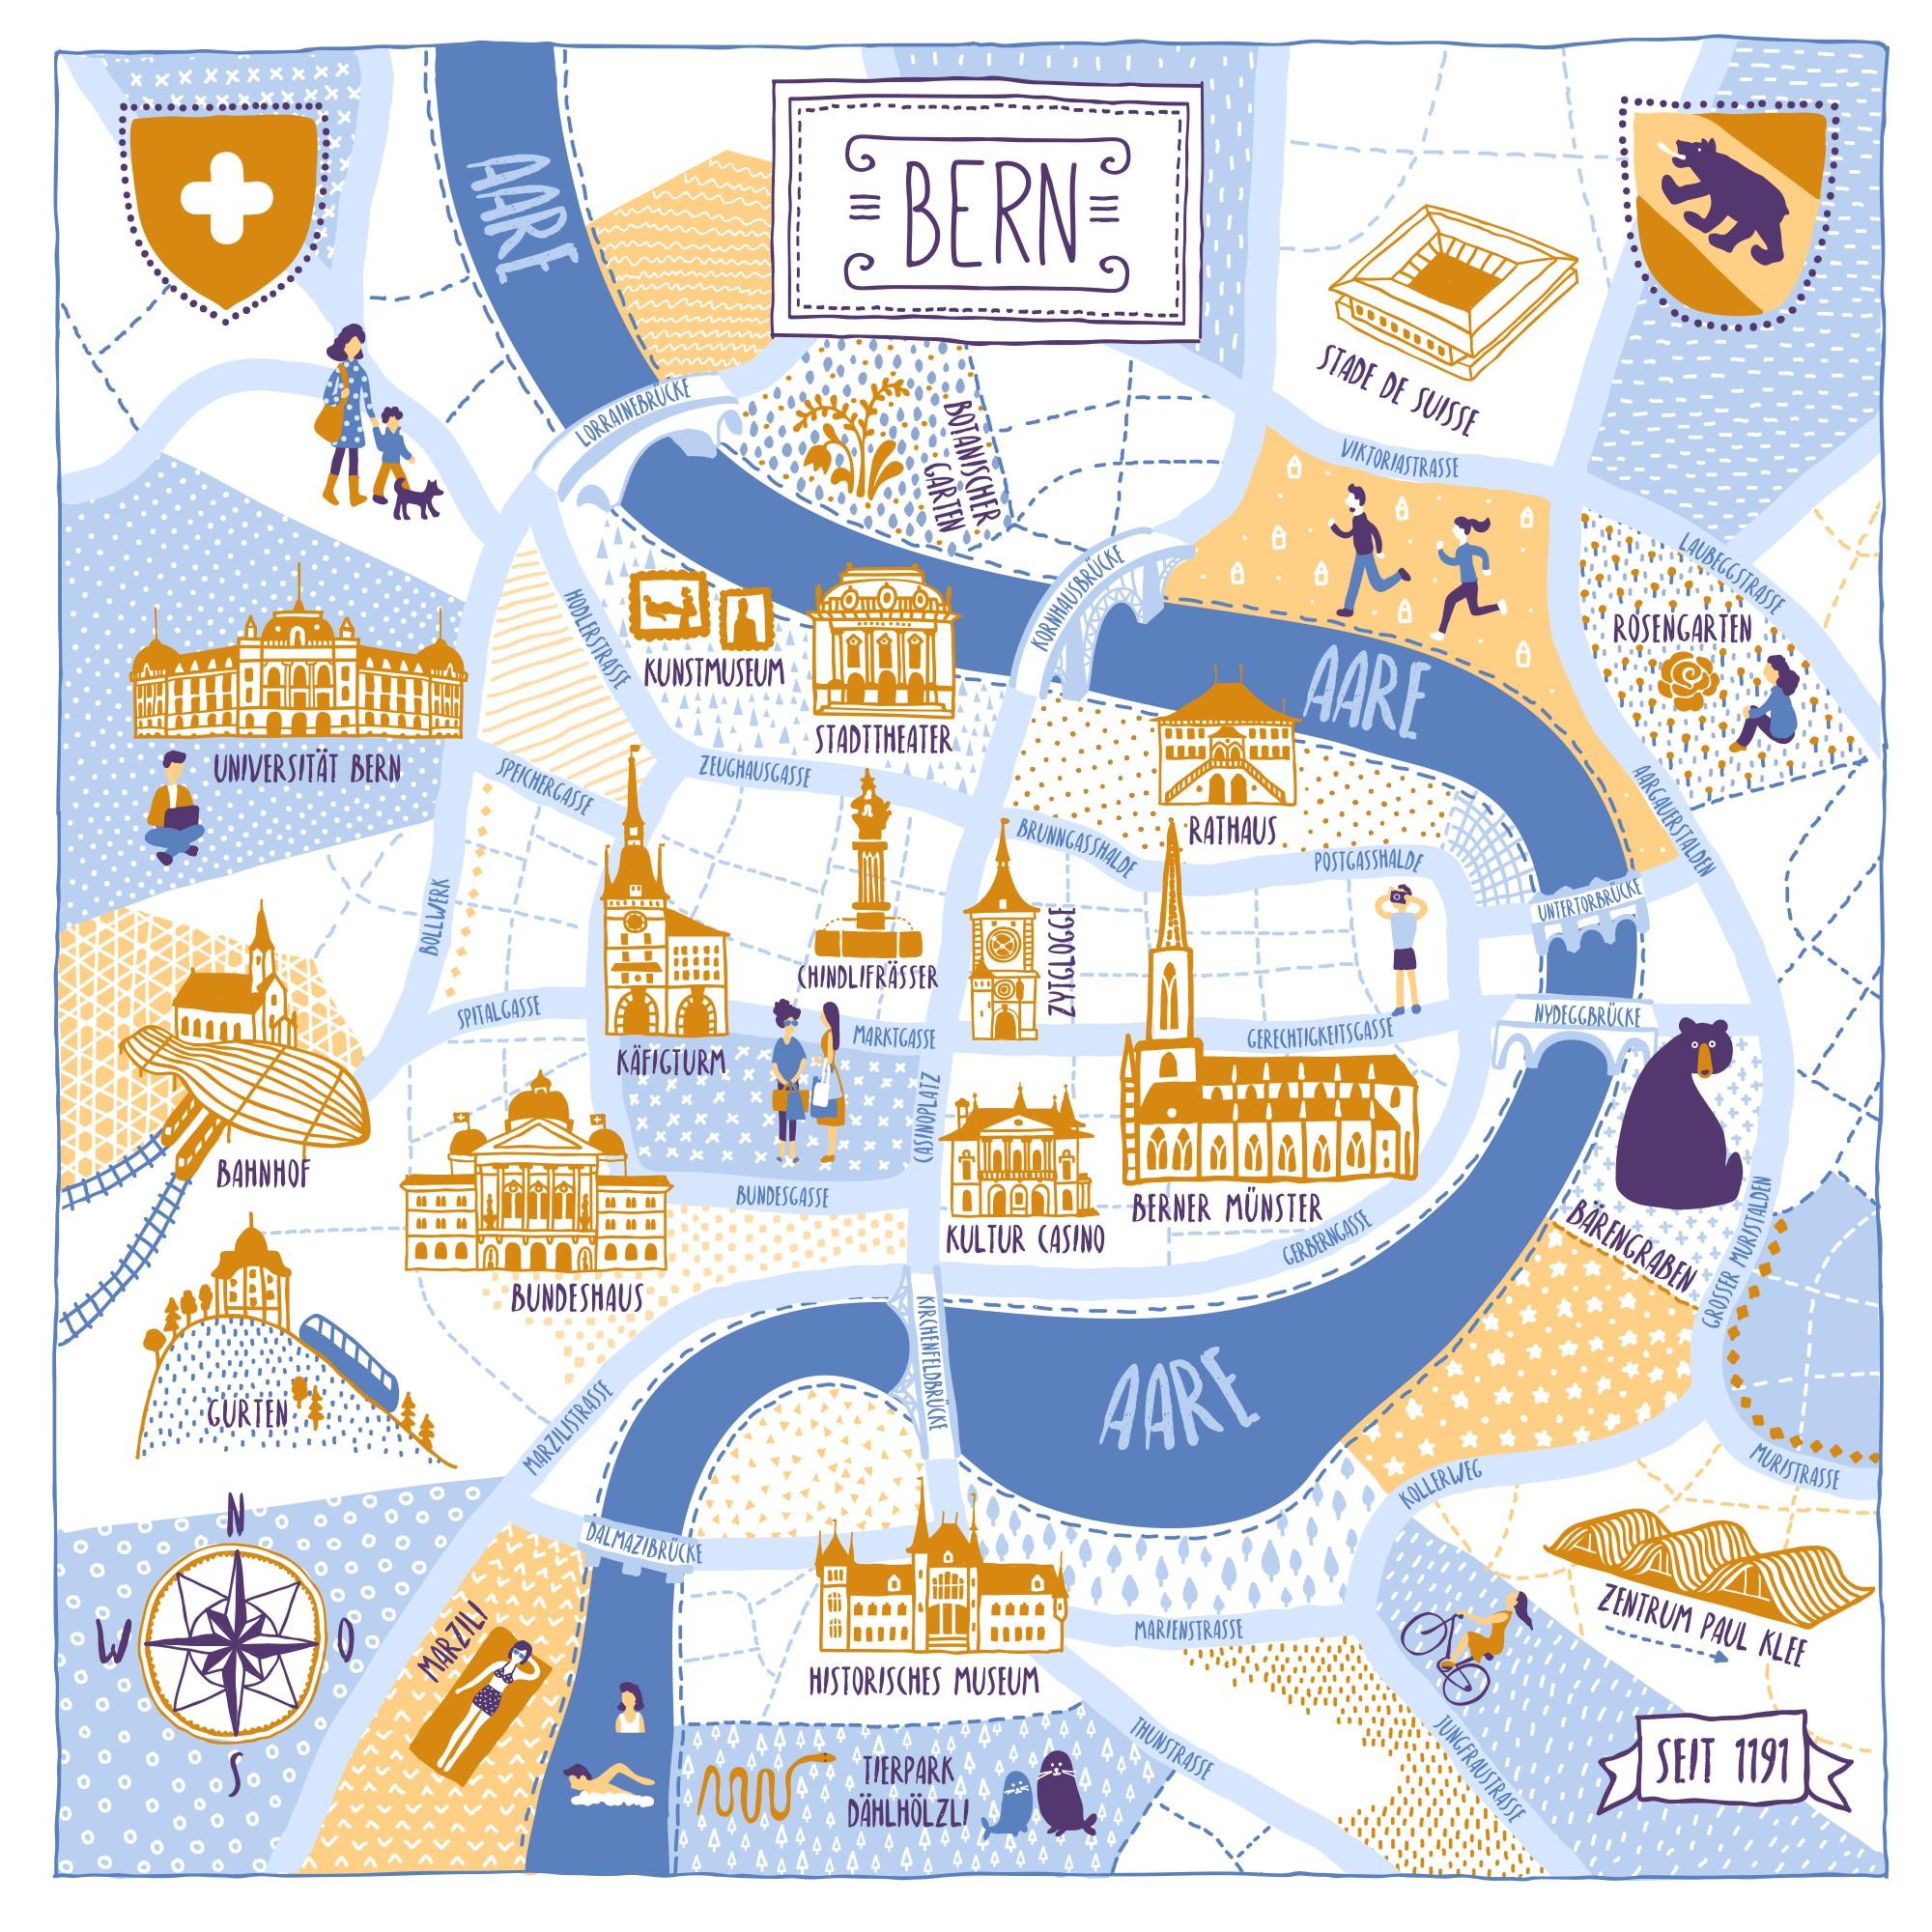 Redesign City Map of Bern / Switzerland